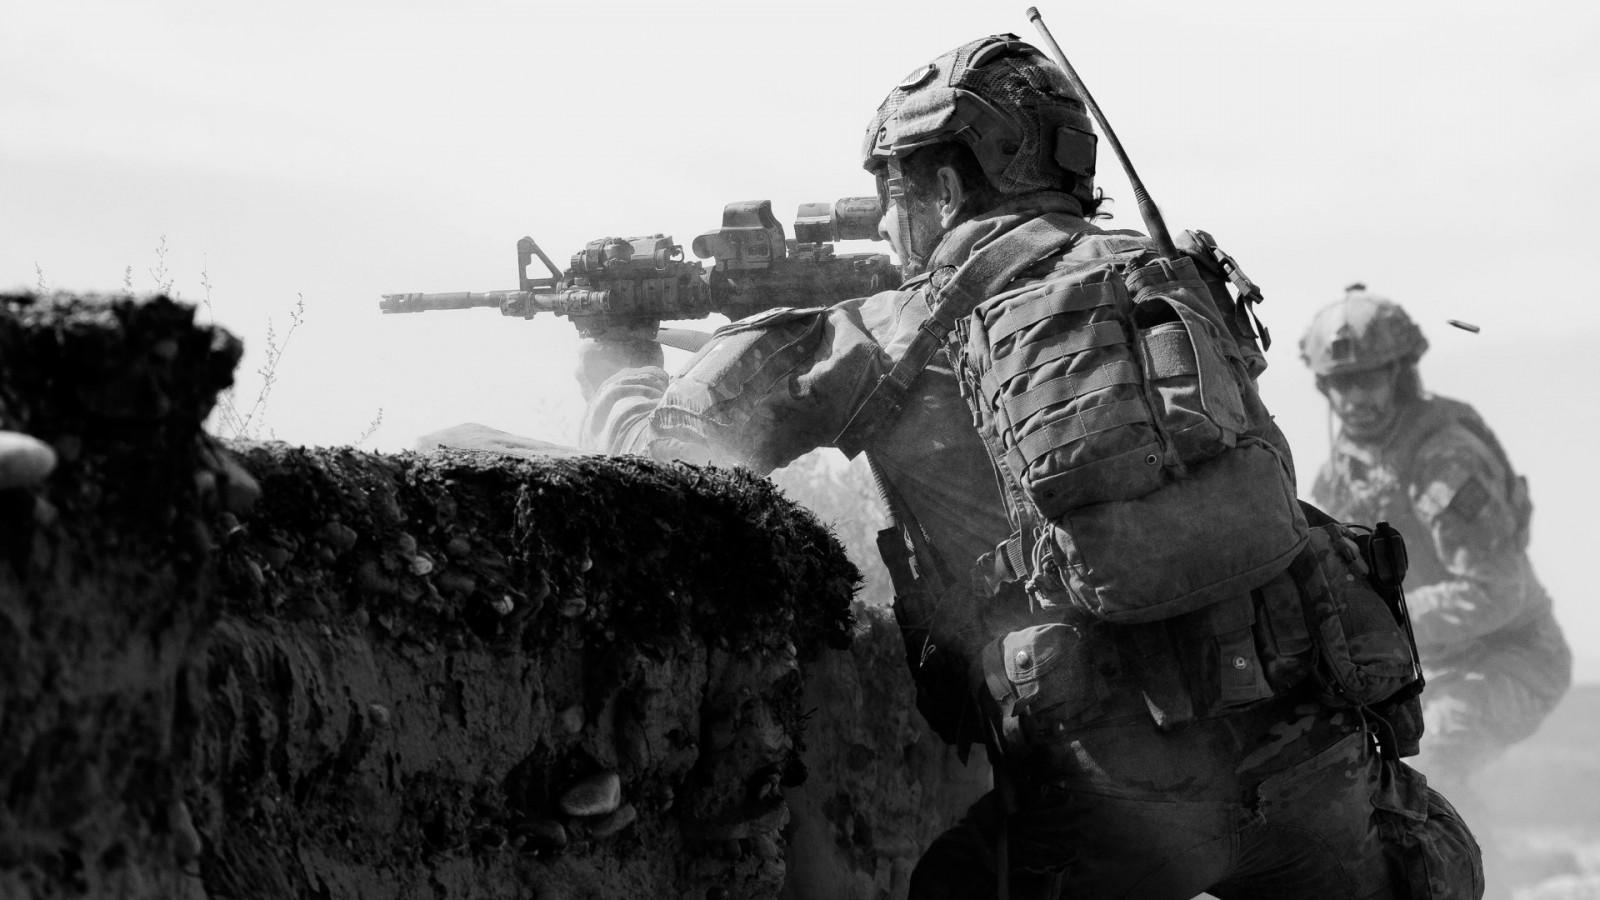 Wallpaper 1920x1080 Px Australian Army Military Soldier